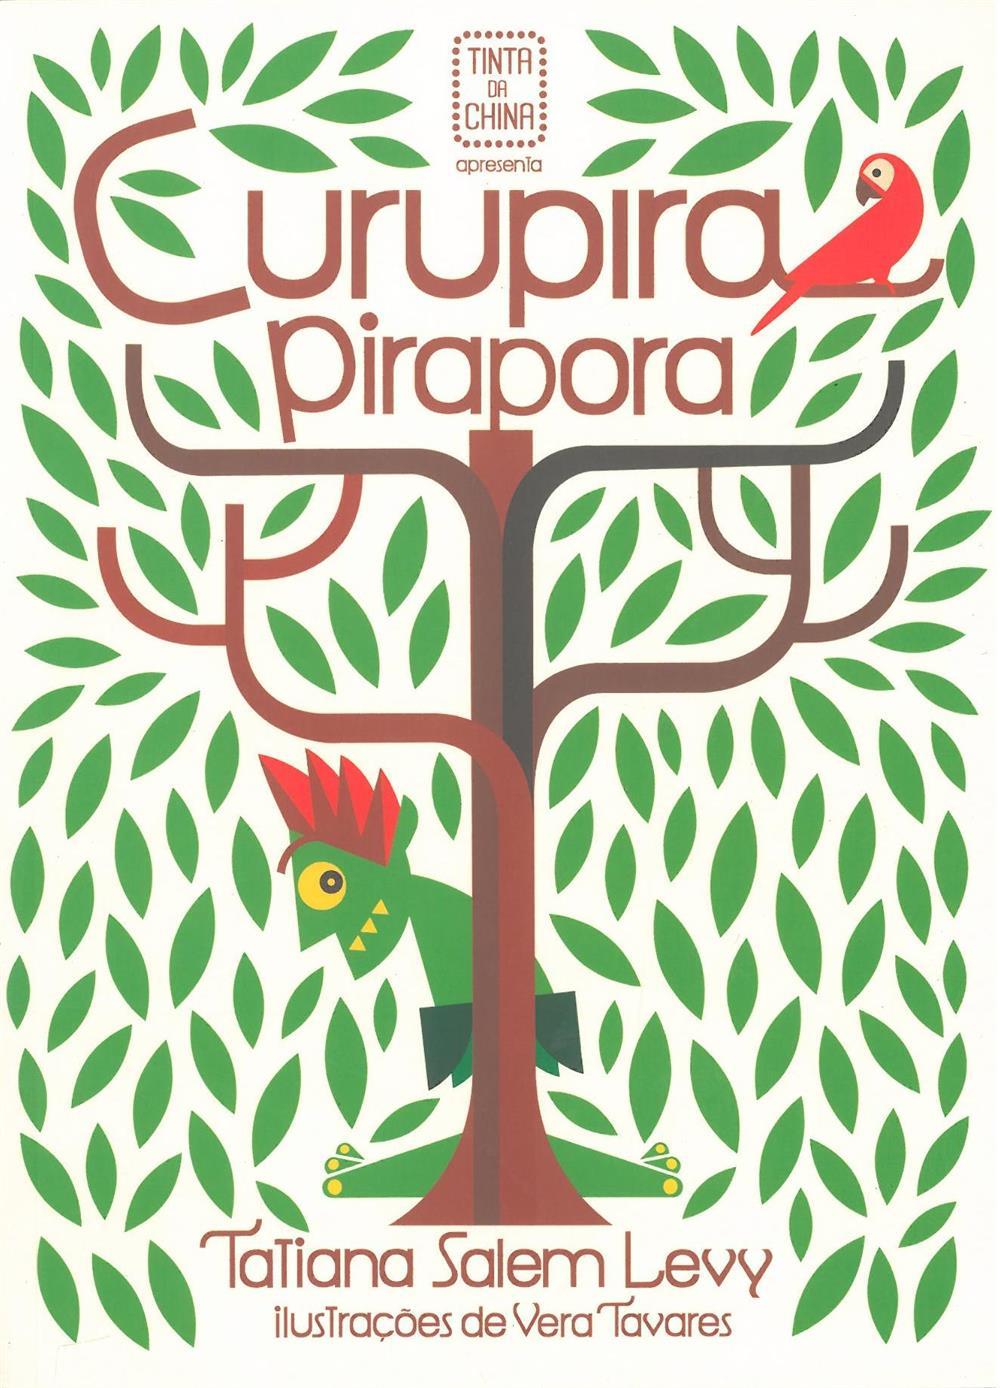 Curupira Pirapora_.jpg